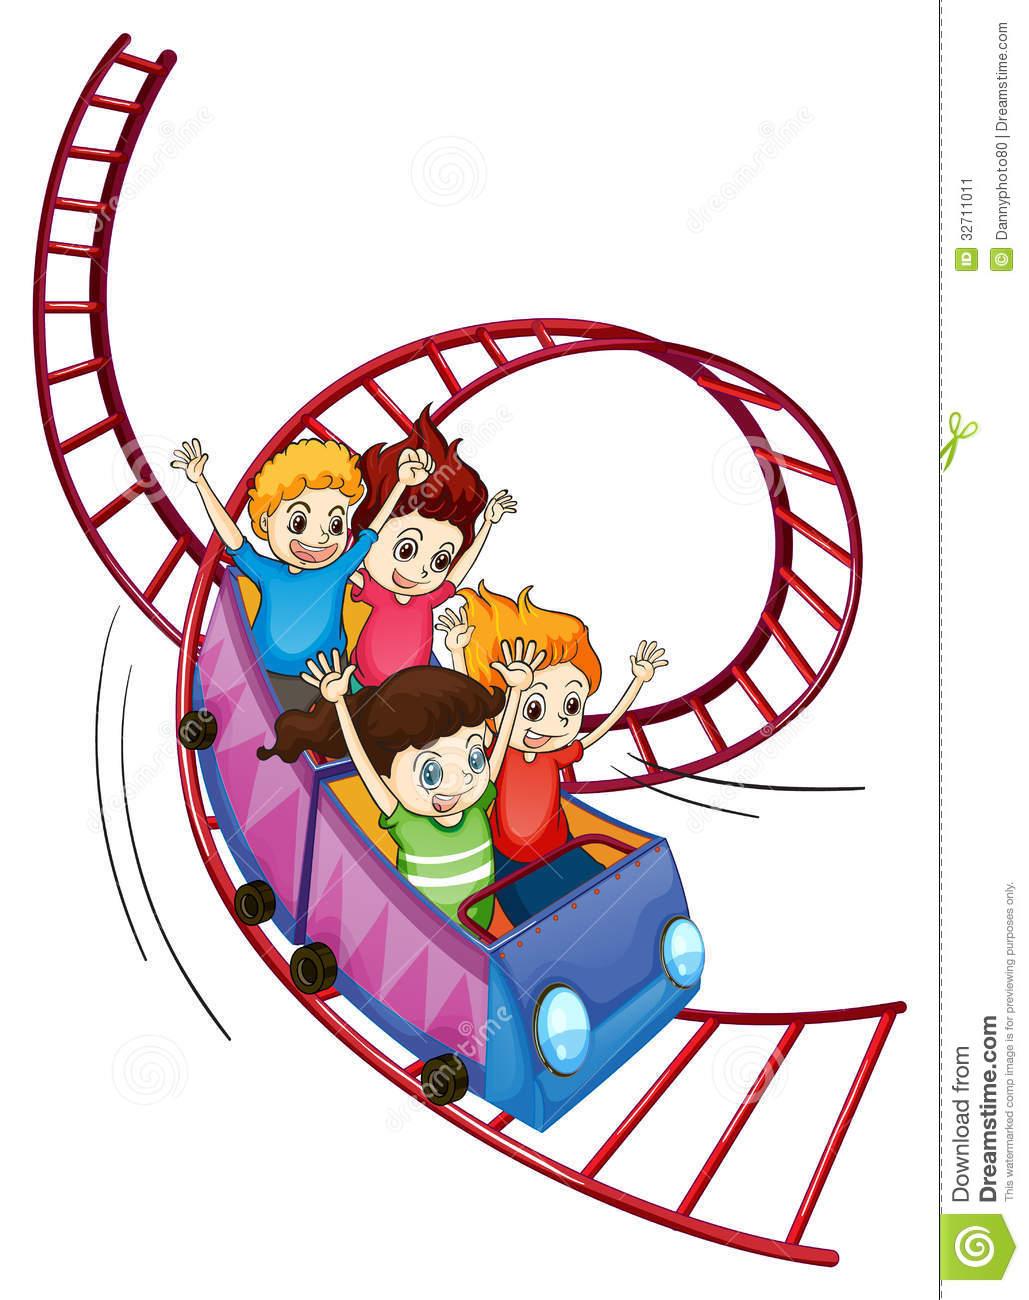 Roller Coaster Cartoon.